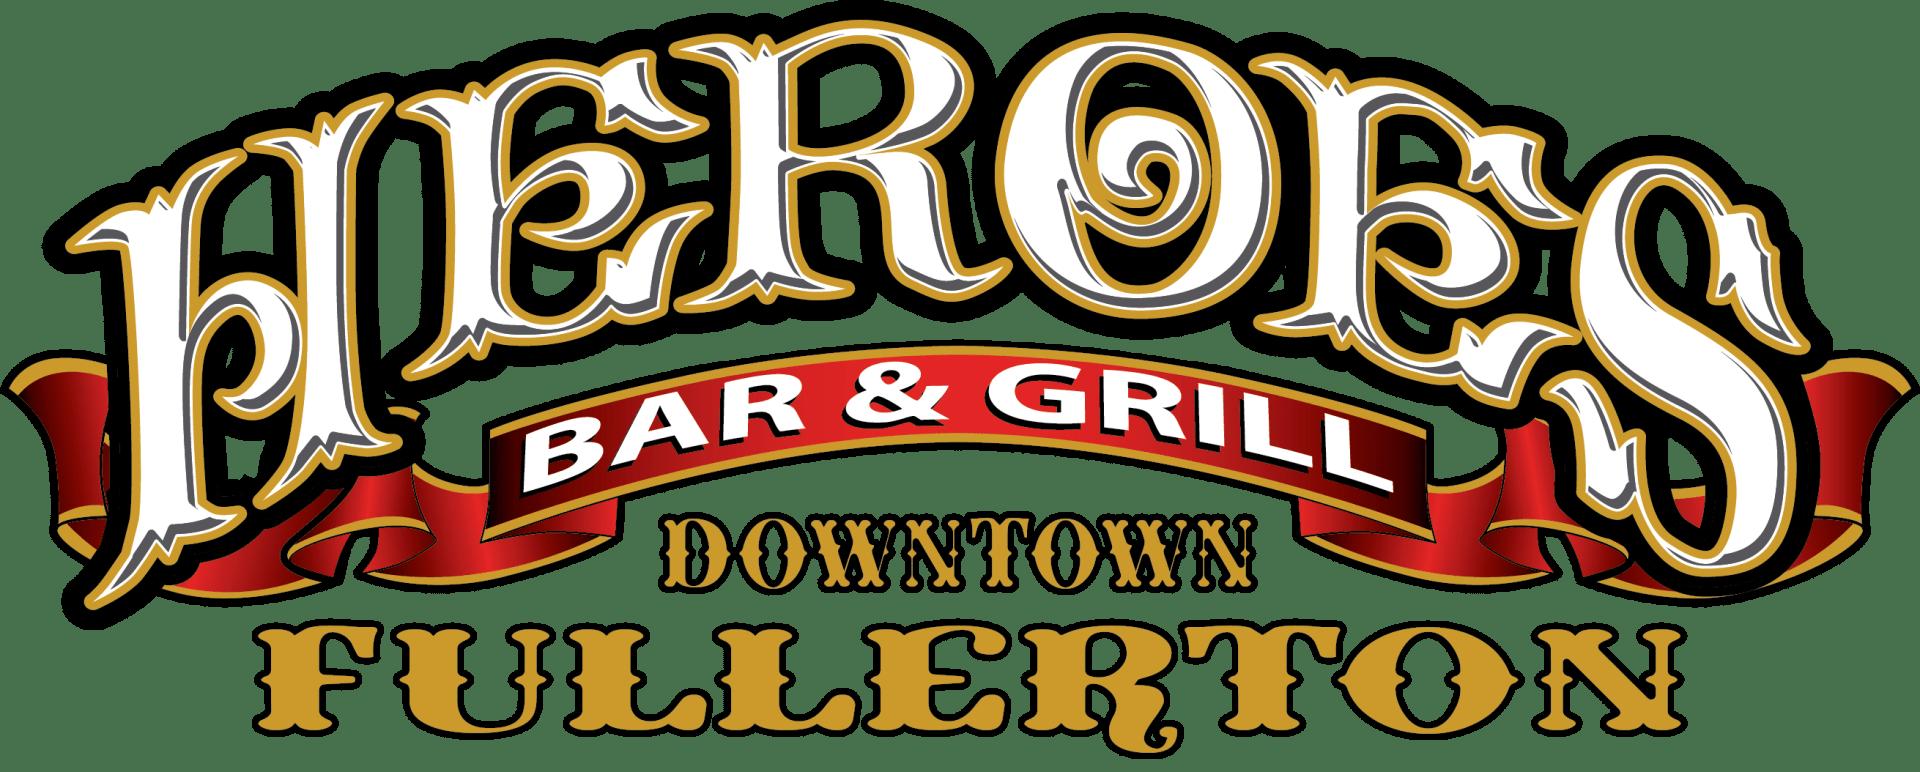 Heroes Bar & Grill Fullerton Logo